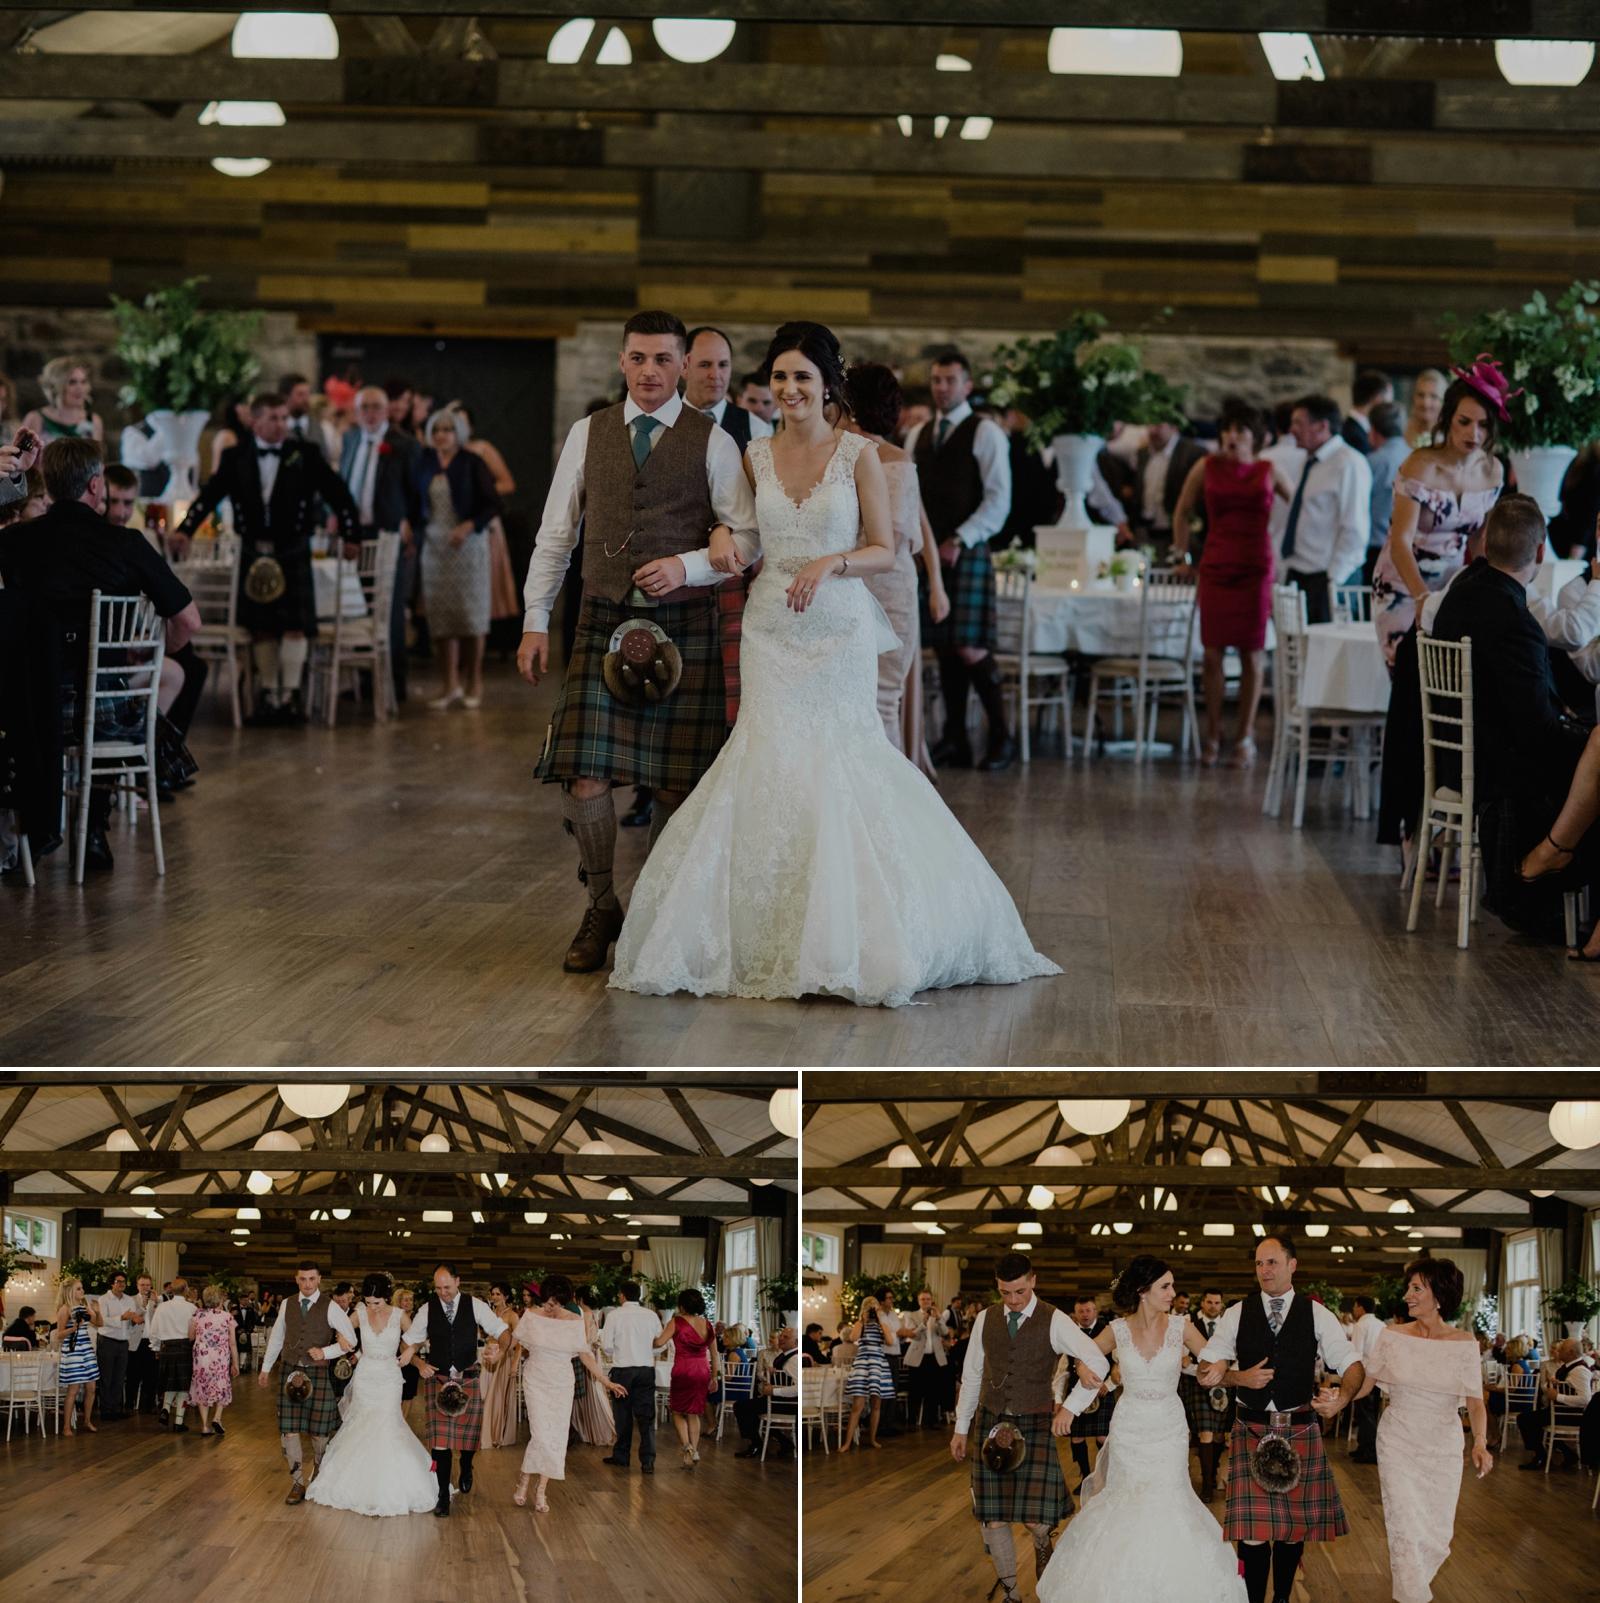 ELLIE_GARY_BARRA_CASTLE_WEDDING_ZOE_ALEXANDRA_PHOTOGRAPHY-0710.jpg